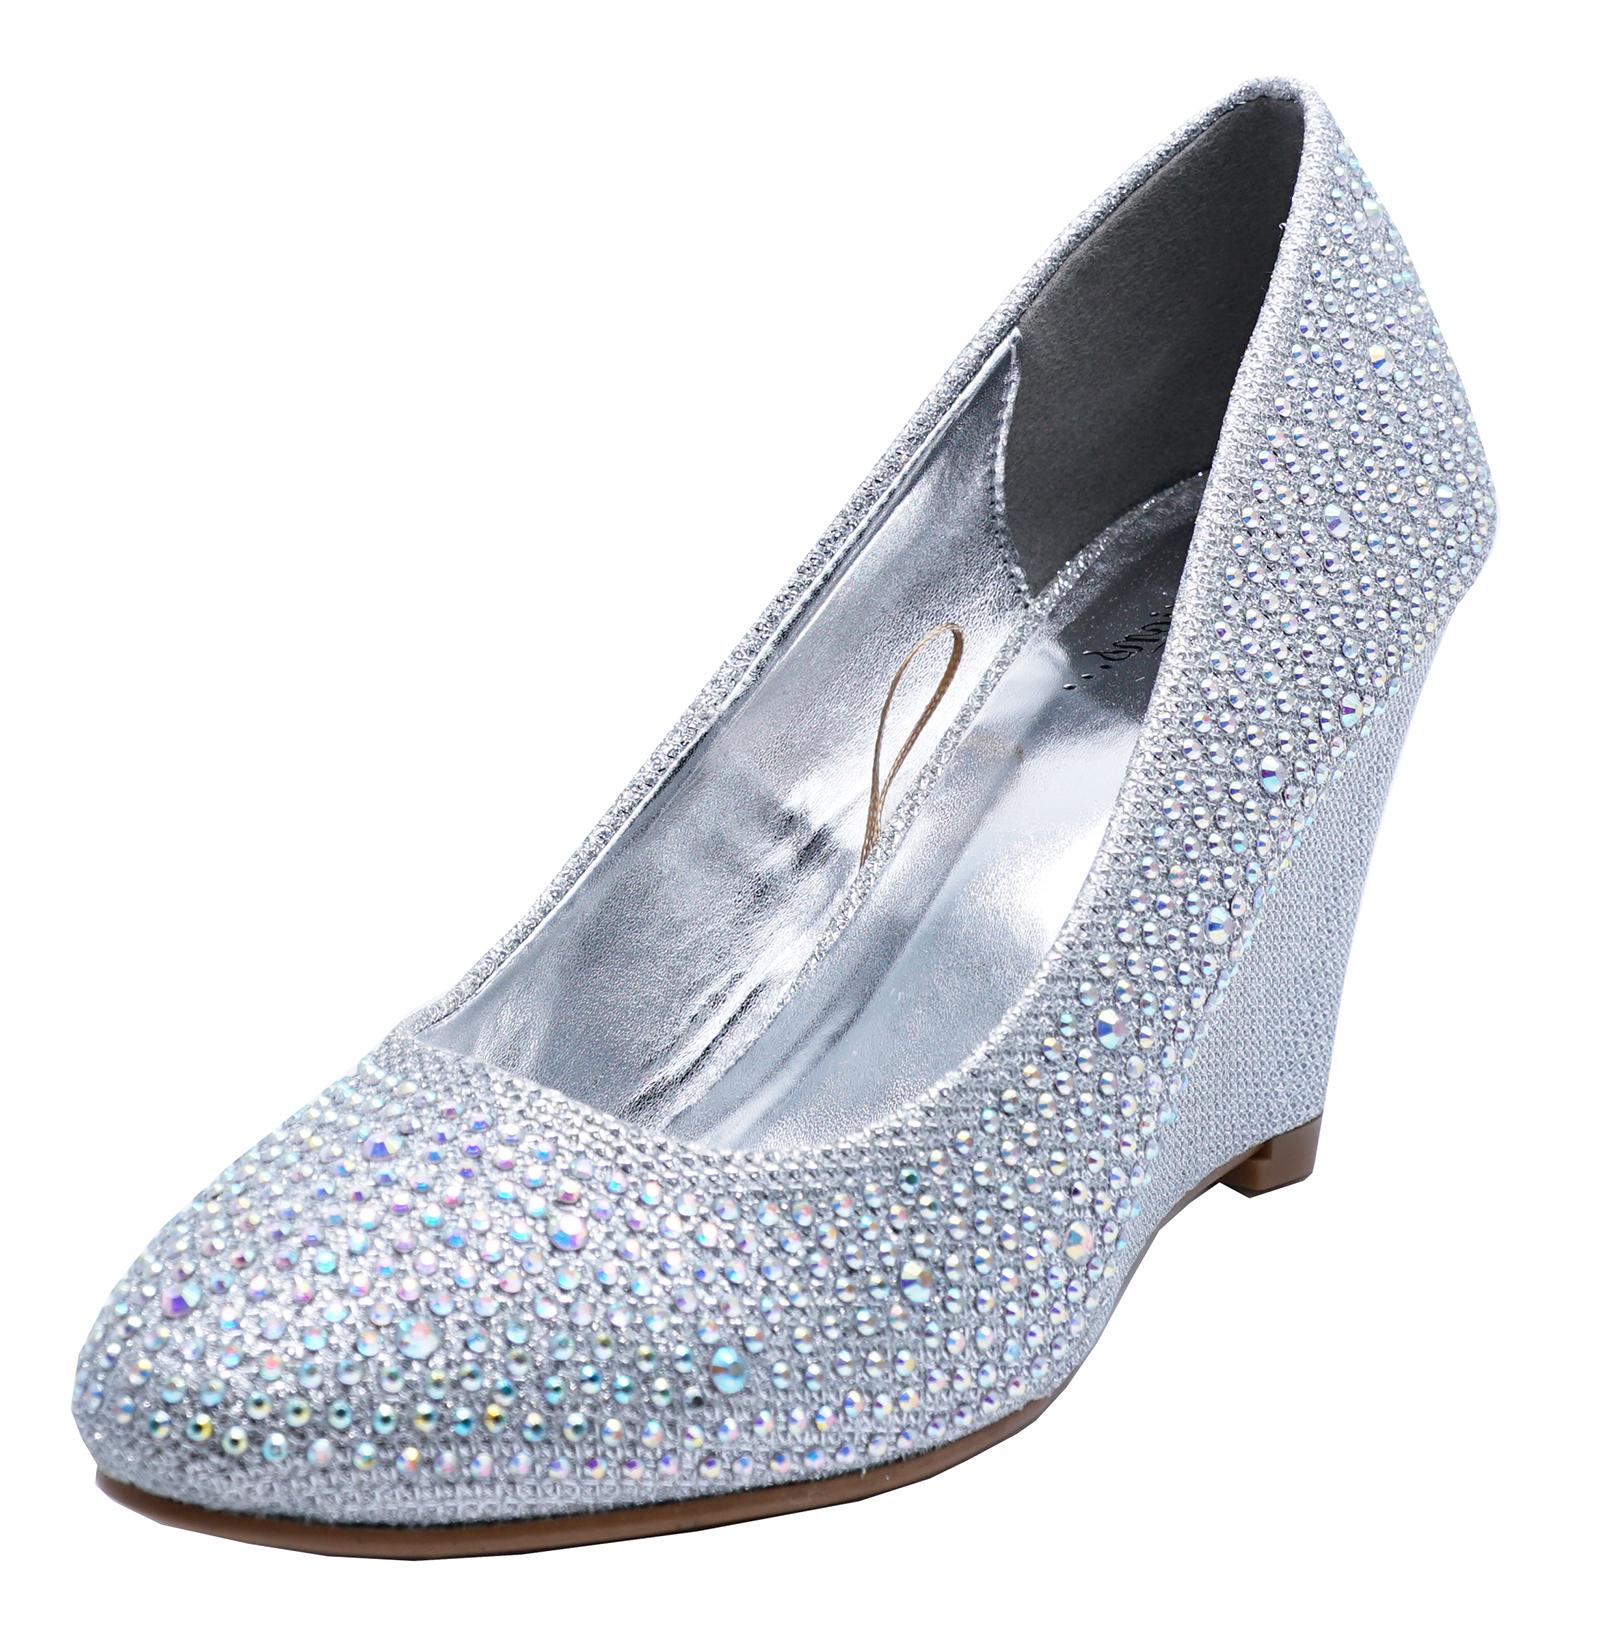 Wedding Silver Heels: WOMENS SILVER WEDDING BRIDAL BRIDESMAID PROM DIAMANTE